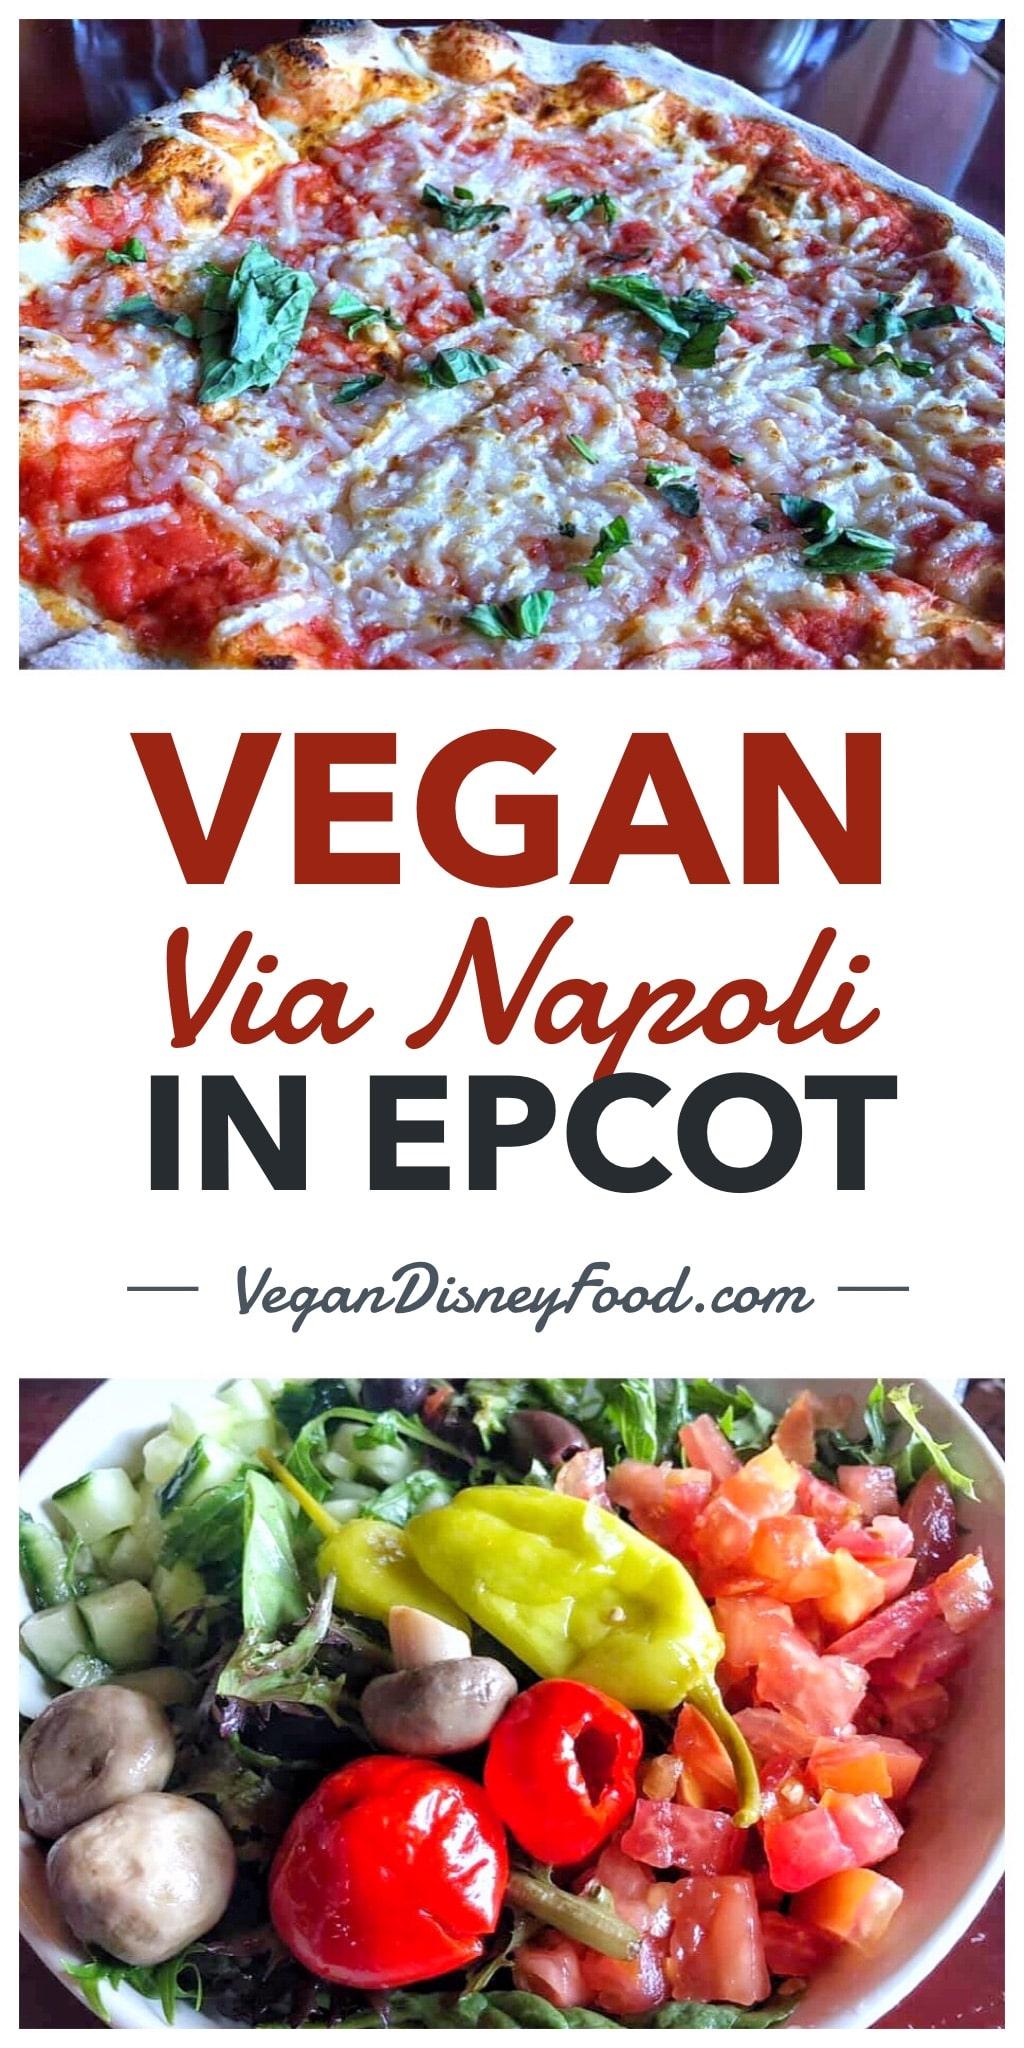 Vegan Margherita Pizza at Via Napoli in the Italy Pavilion at Epcot in Walt Disney World